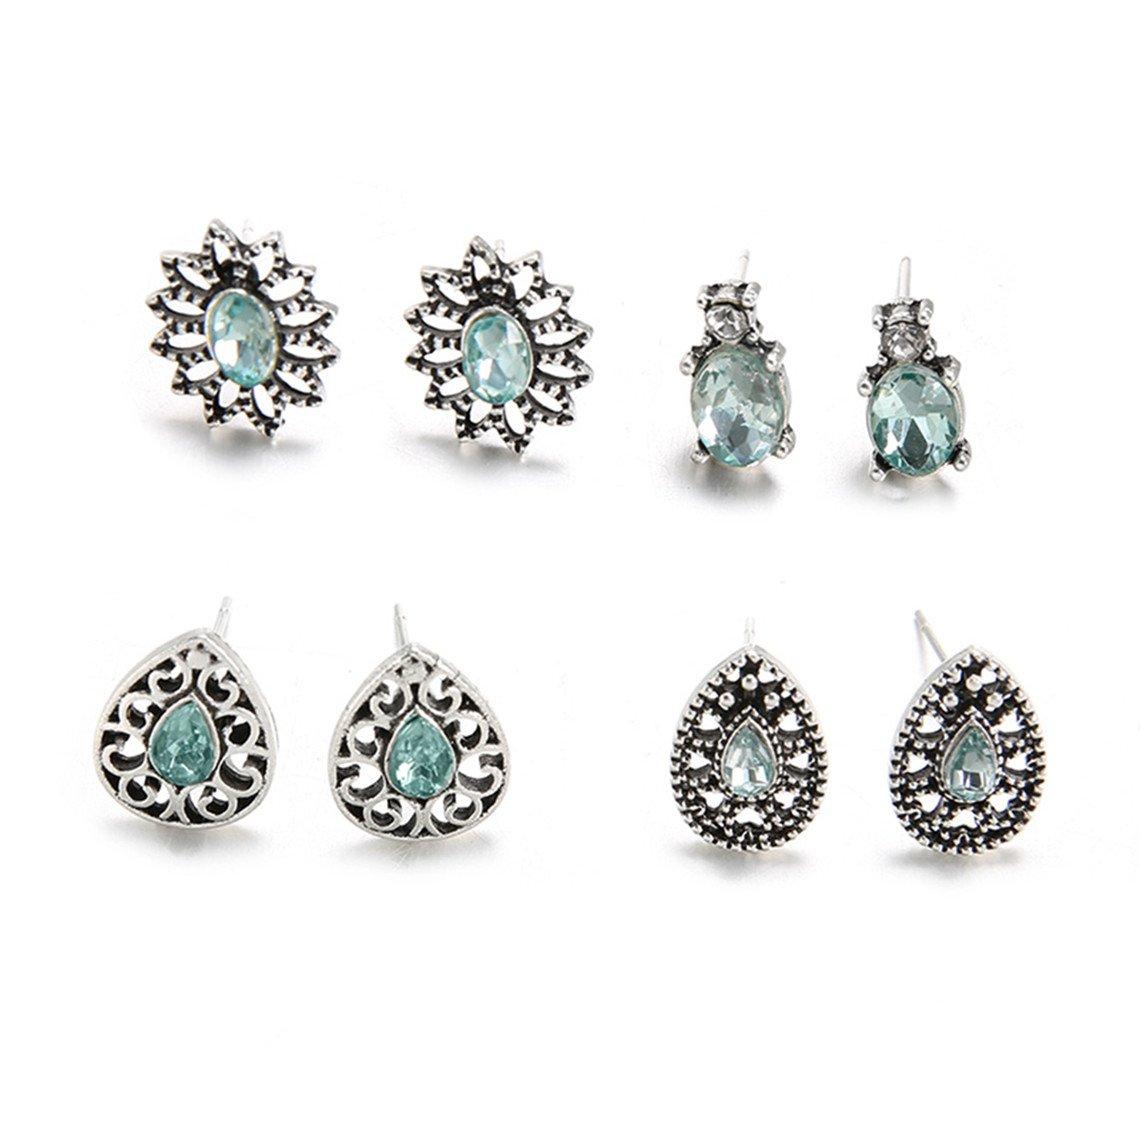 Rurah Women's Exquisite Fashion Jewelry Flower Earring Water Drops Shape Stud Crystal Diamond Earring for Girl